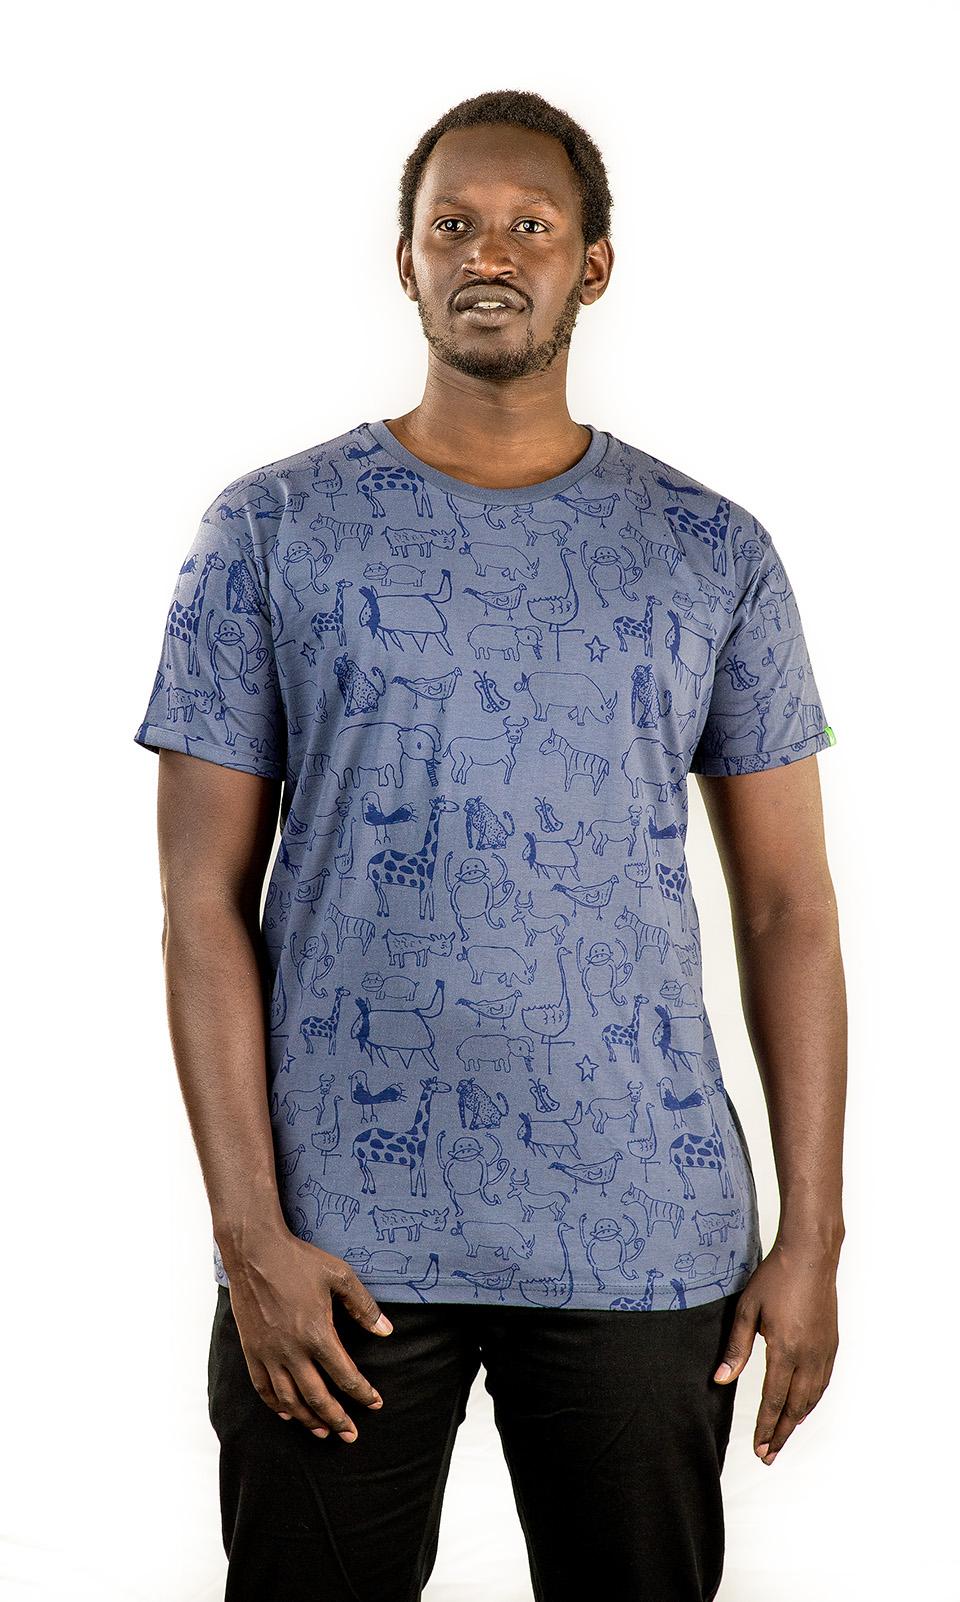 Kipepeo_Fair_Trade_Shirt_Nairobi_Männer_Charcoal_Made_in_Kenya (5)